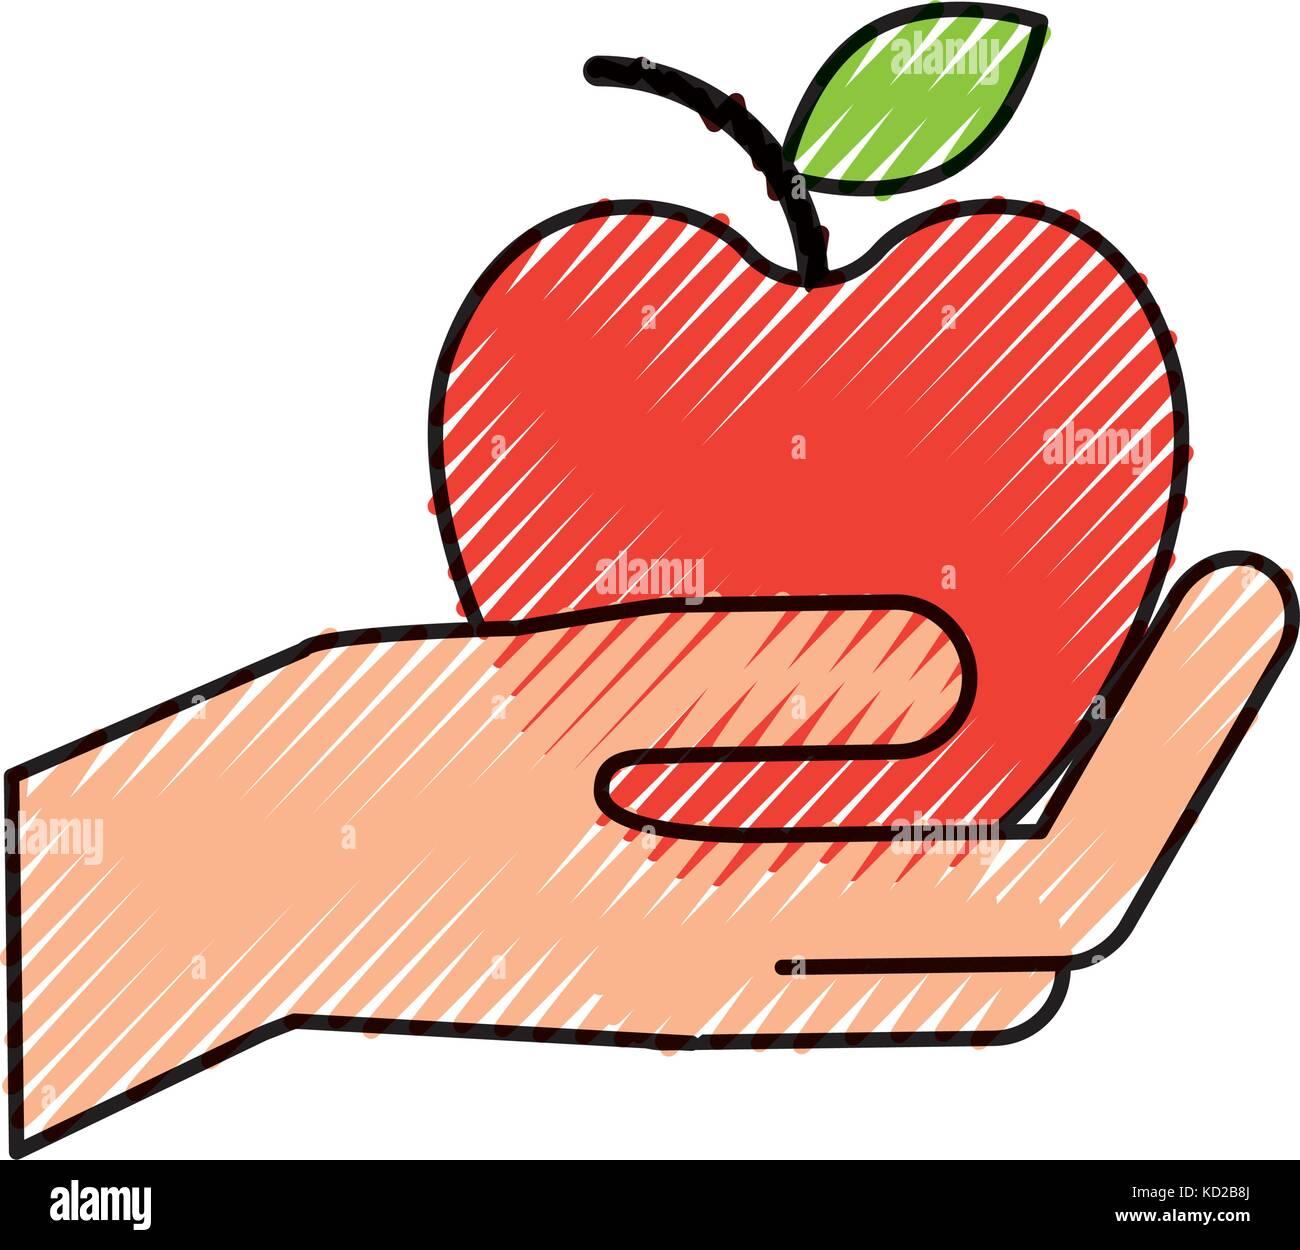 hand holding apple fruit fresh shop market - Stock Vector